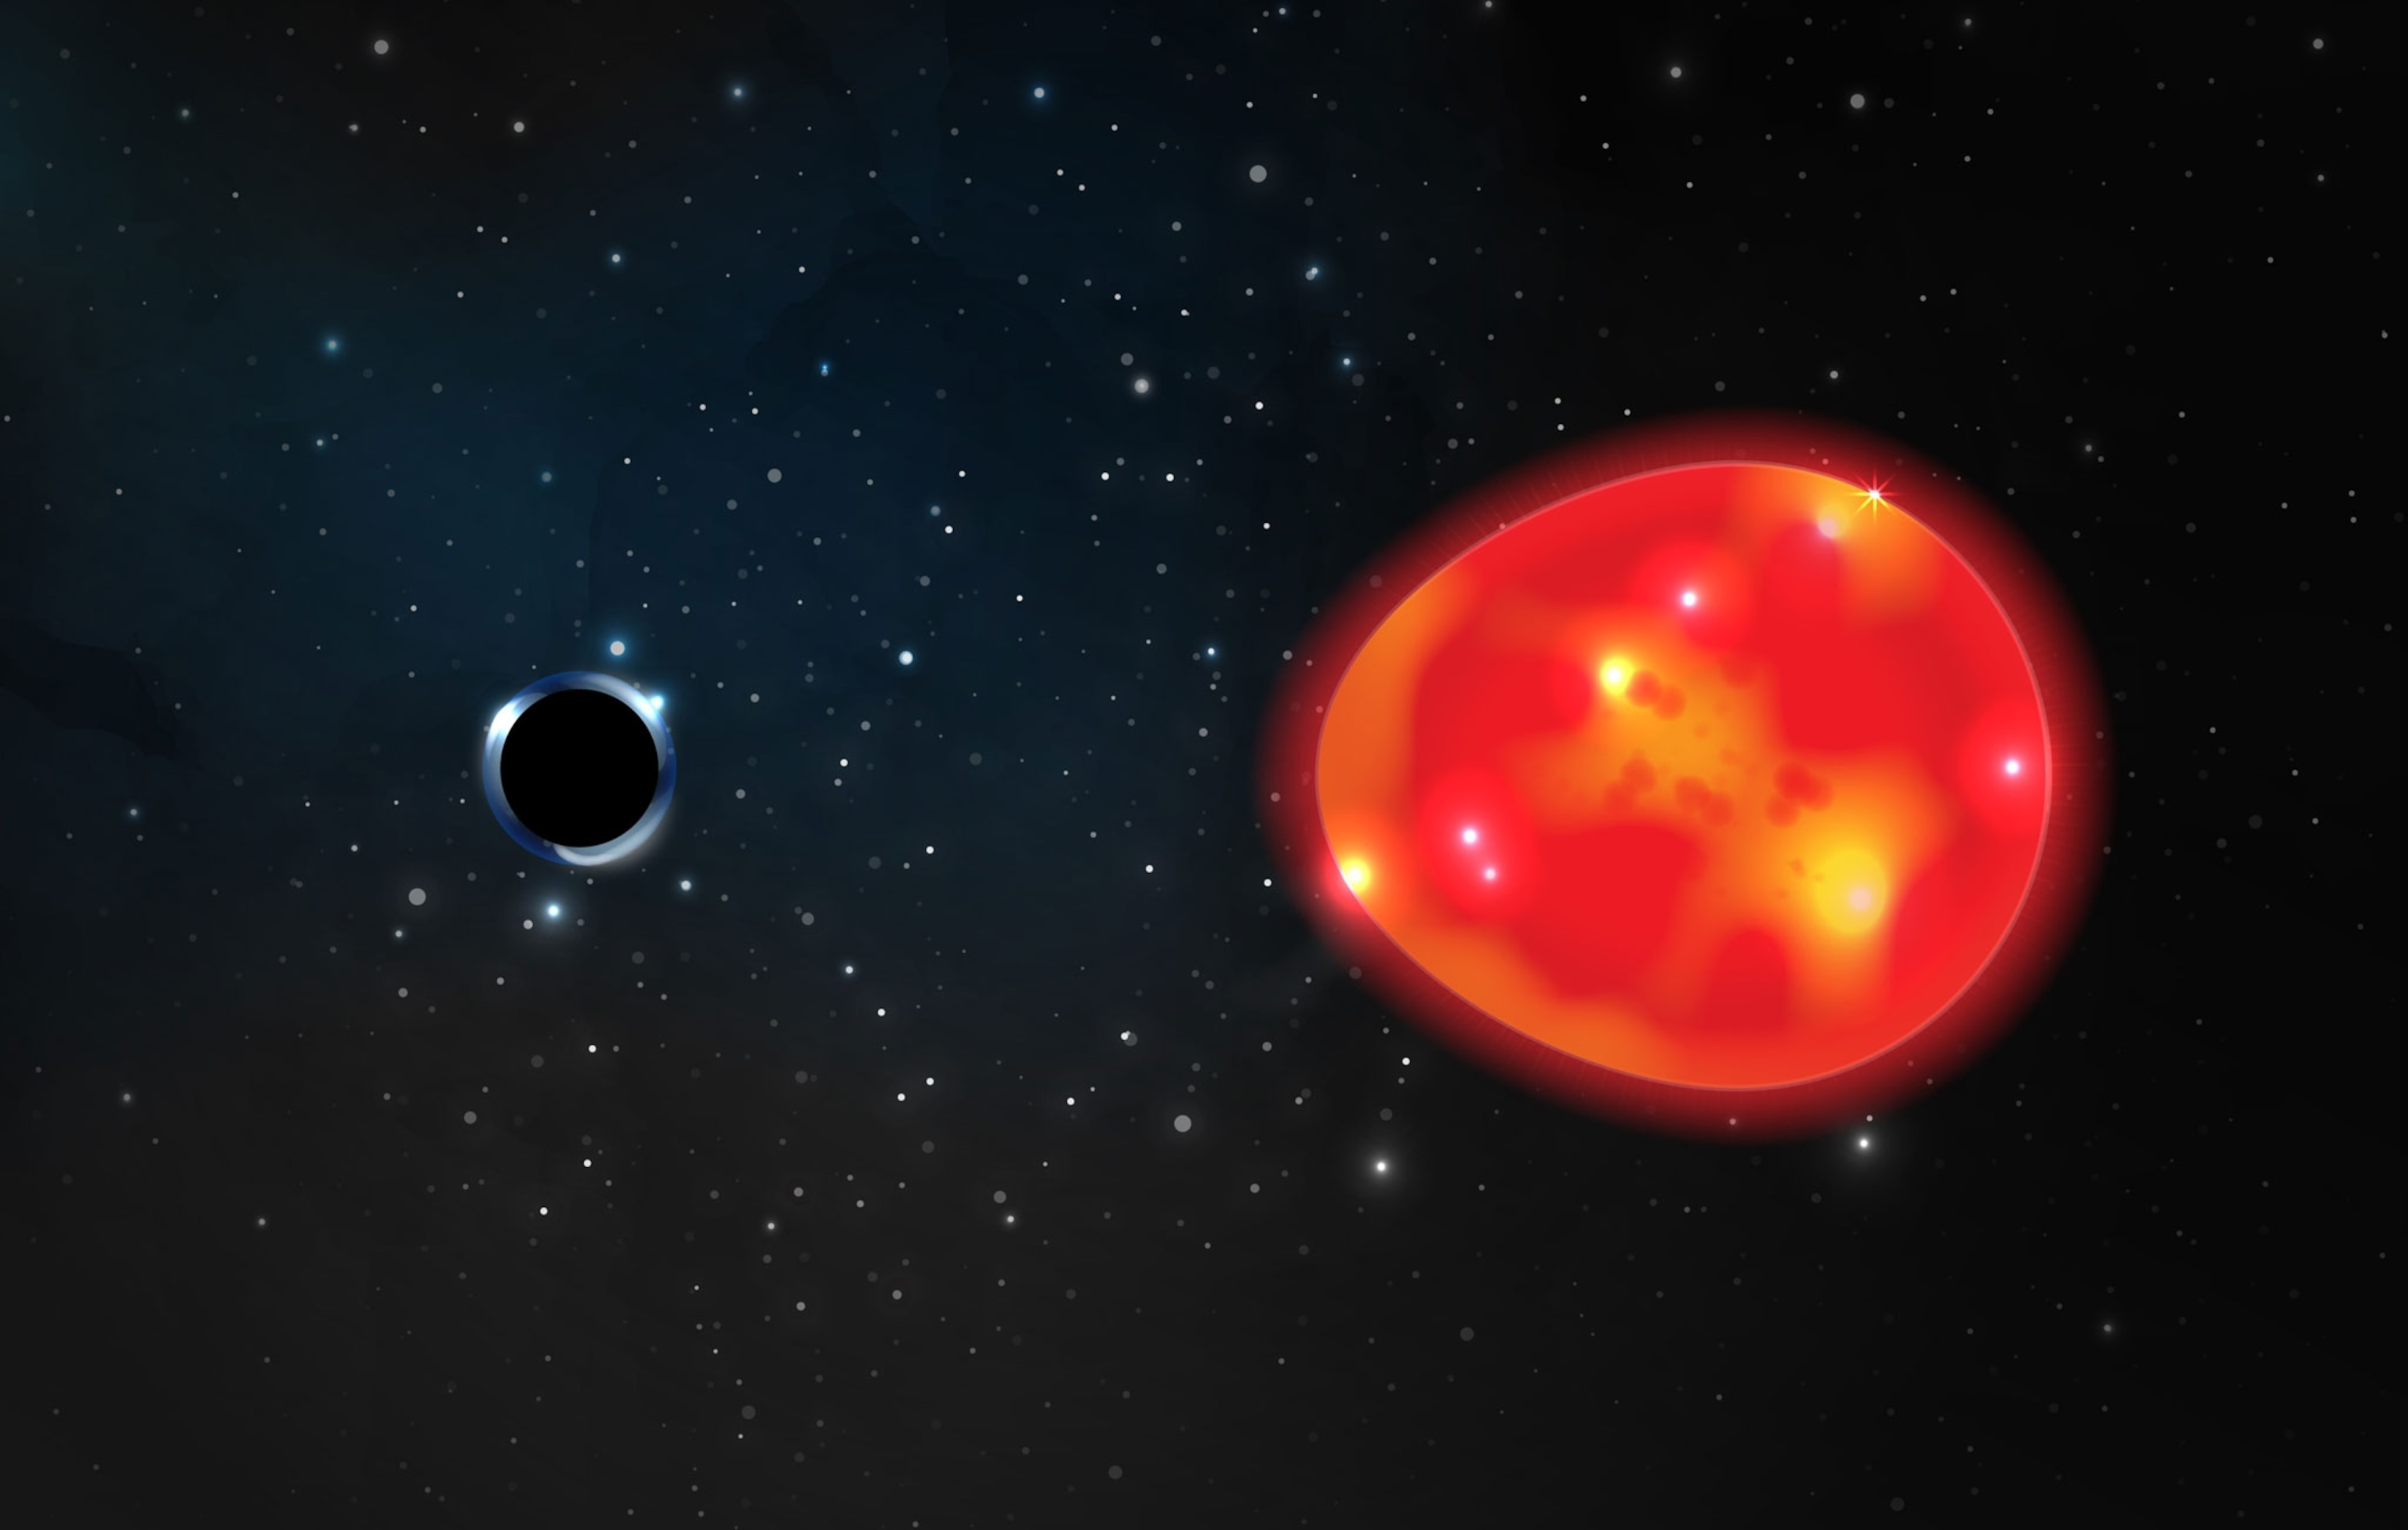 blackhole-redgiant-tidaldistortion-final.jpg